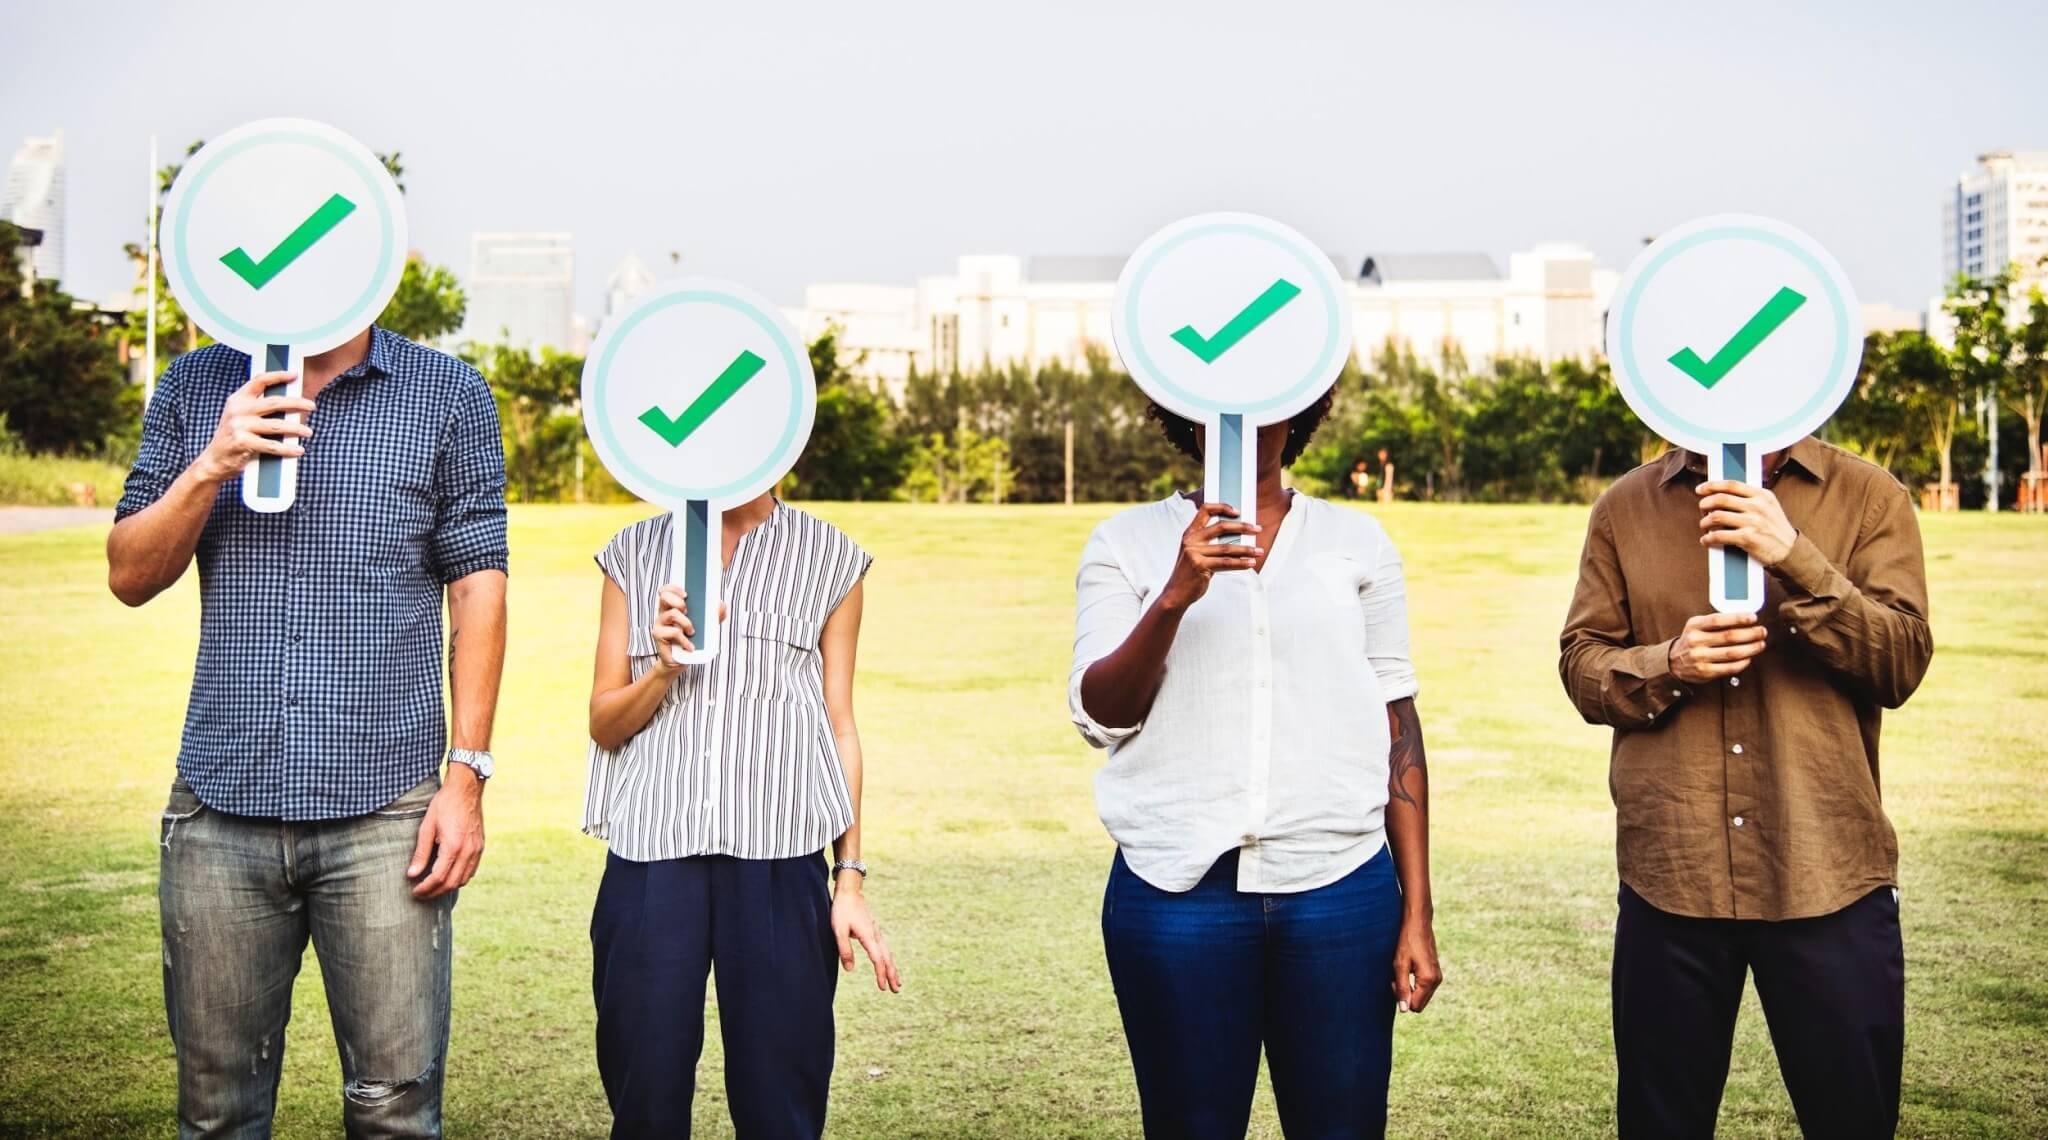 Millennials are recruiting as employees